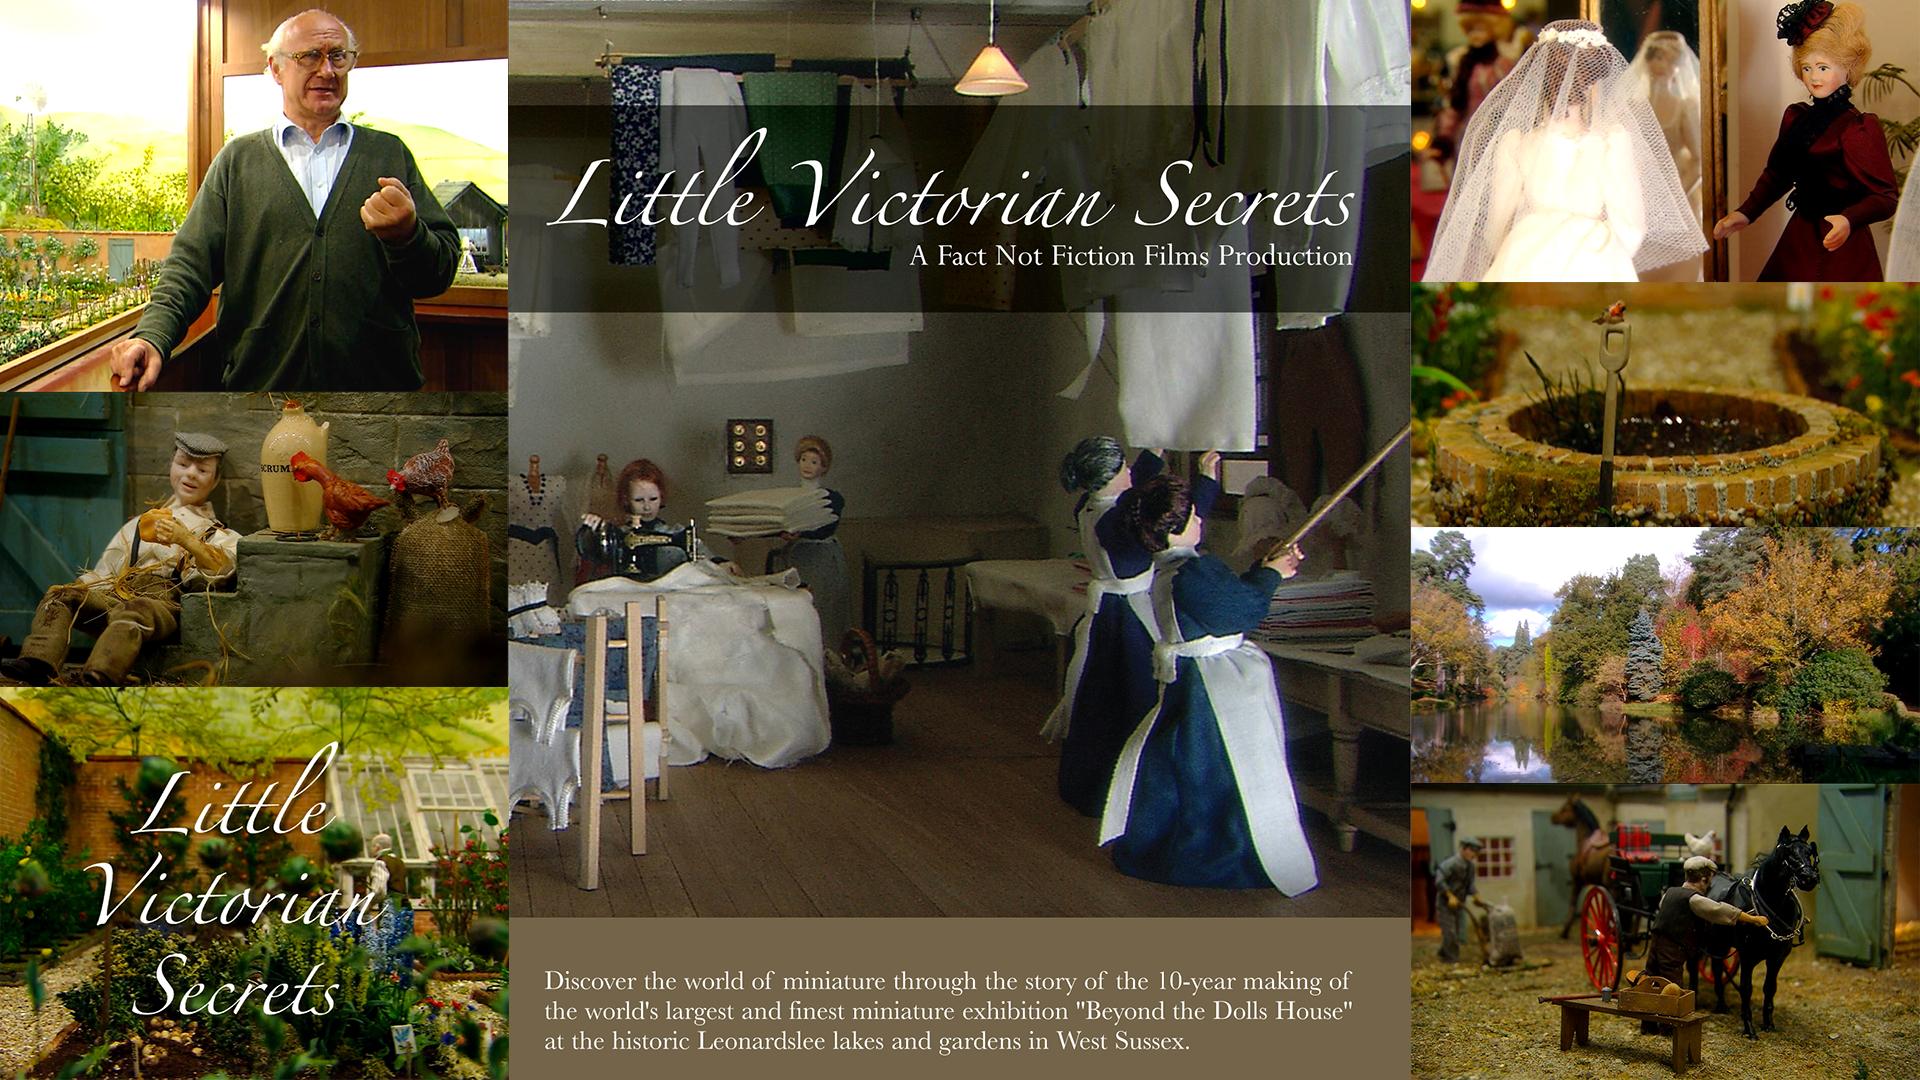 Little Victorian Secrets